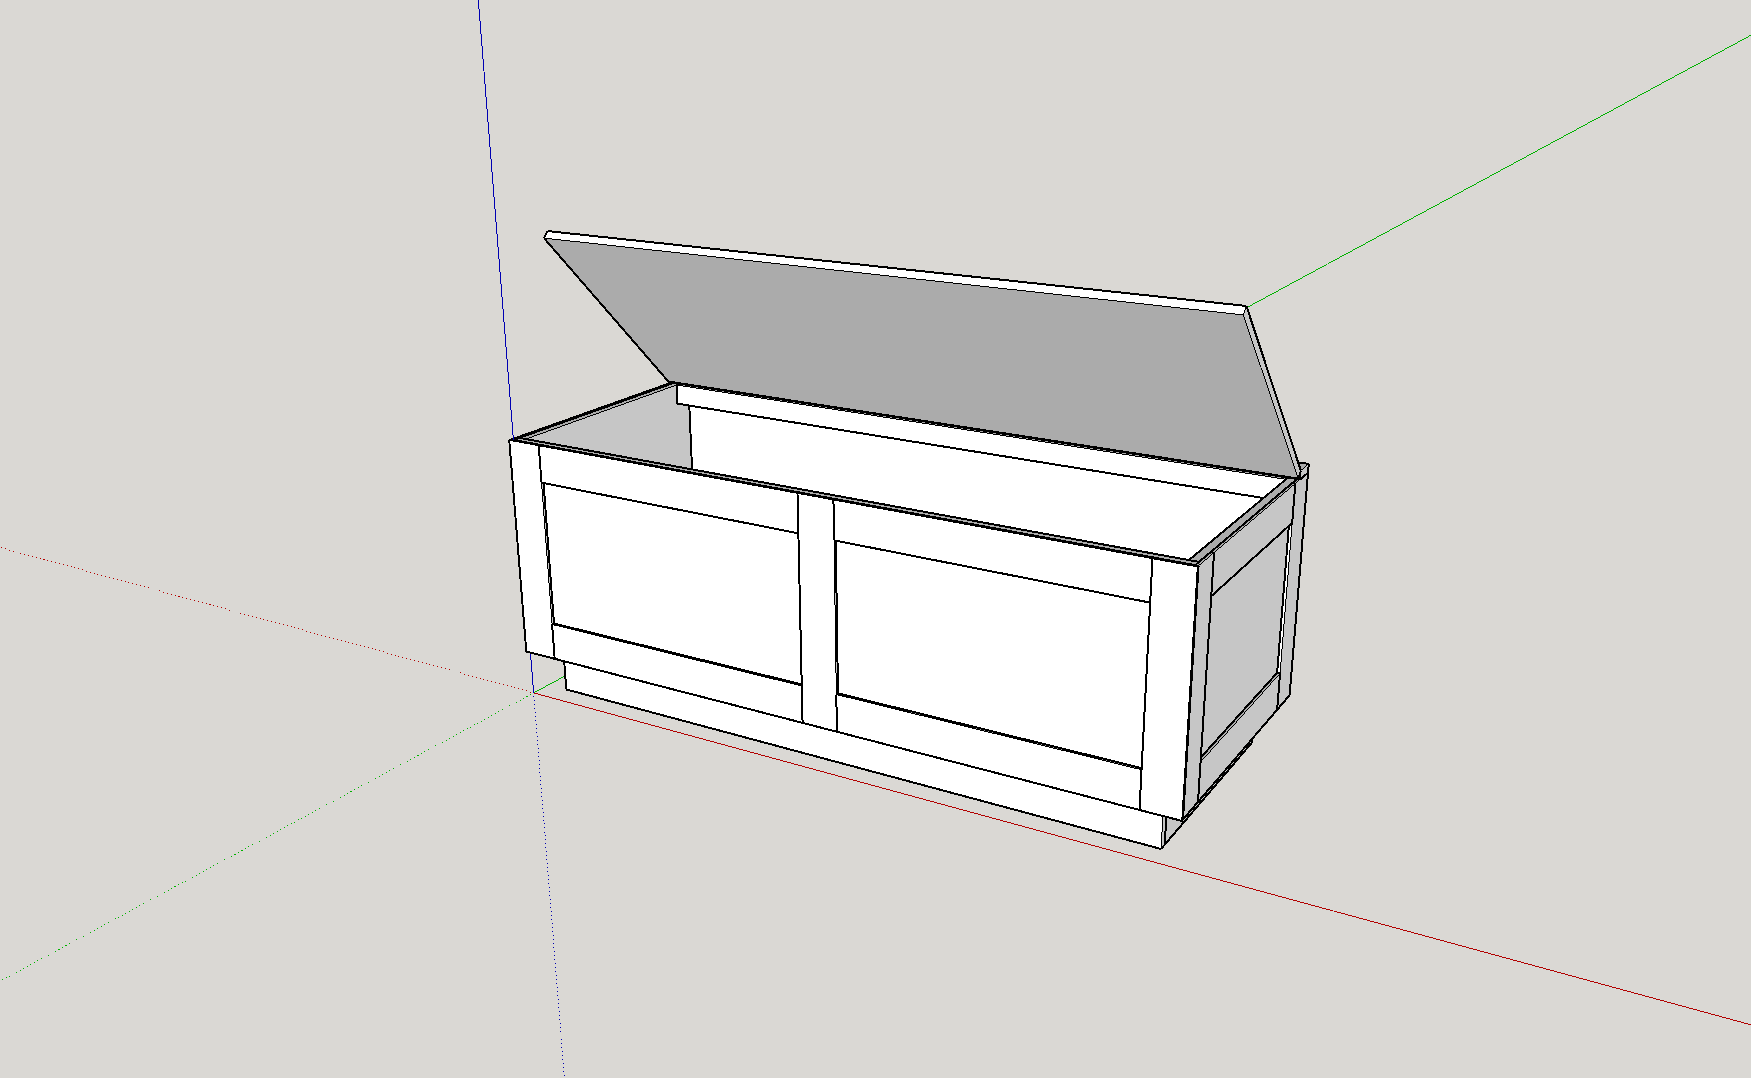 Screenshot_2019-03-12-22-23-34-065_com.trimble.buildings.sketchup.png